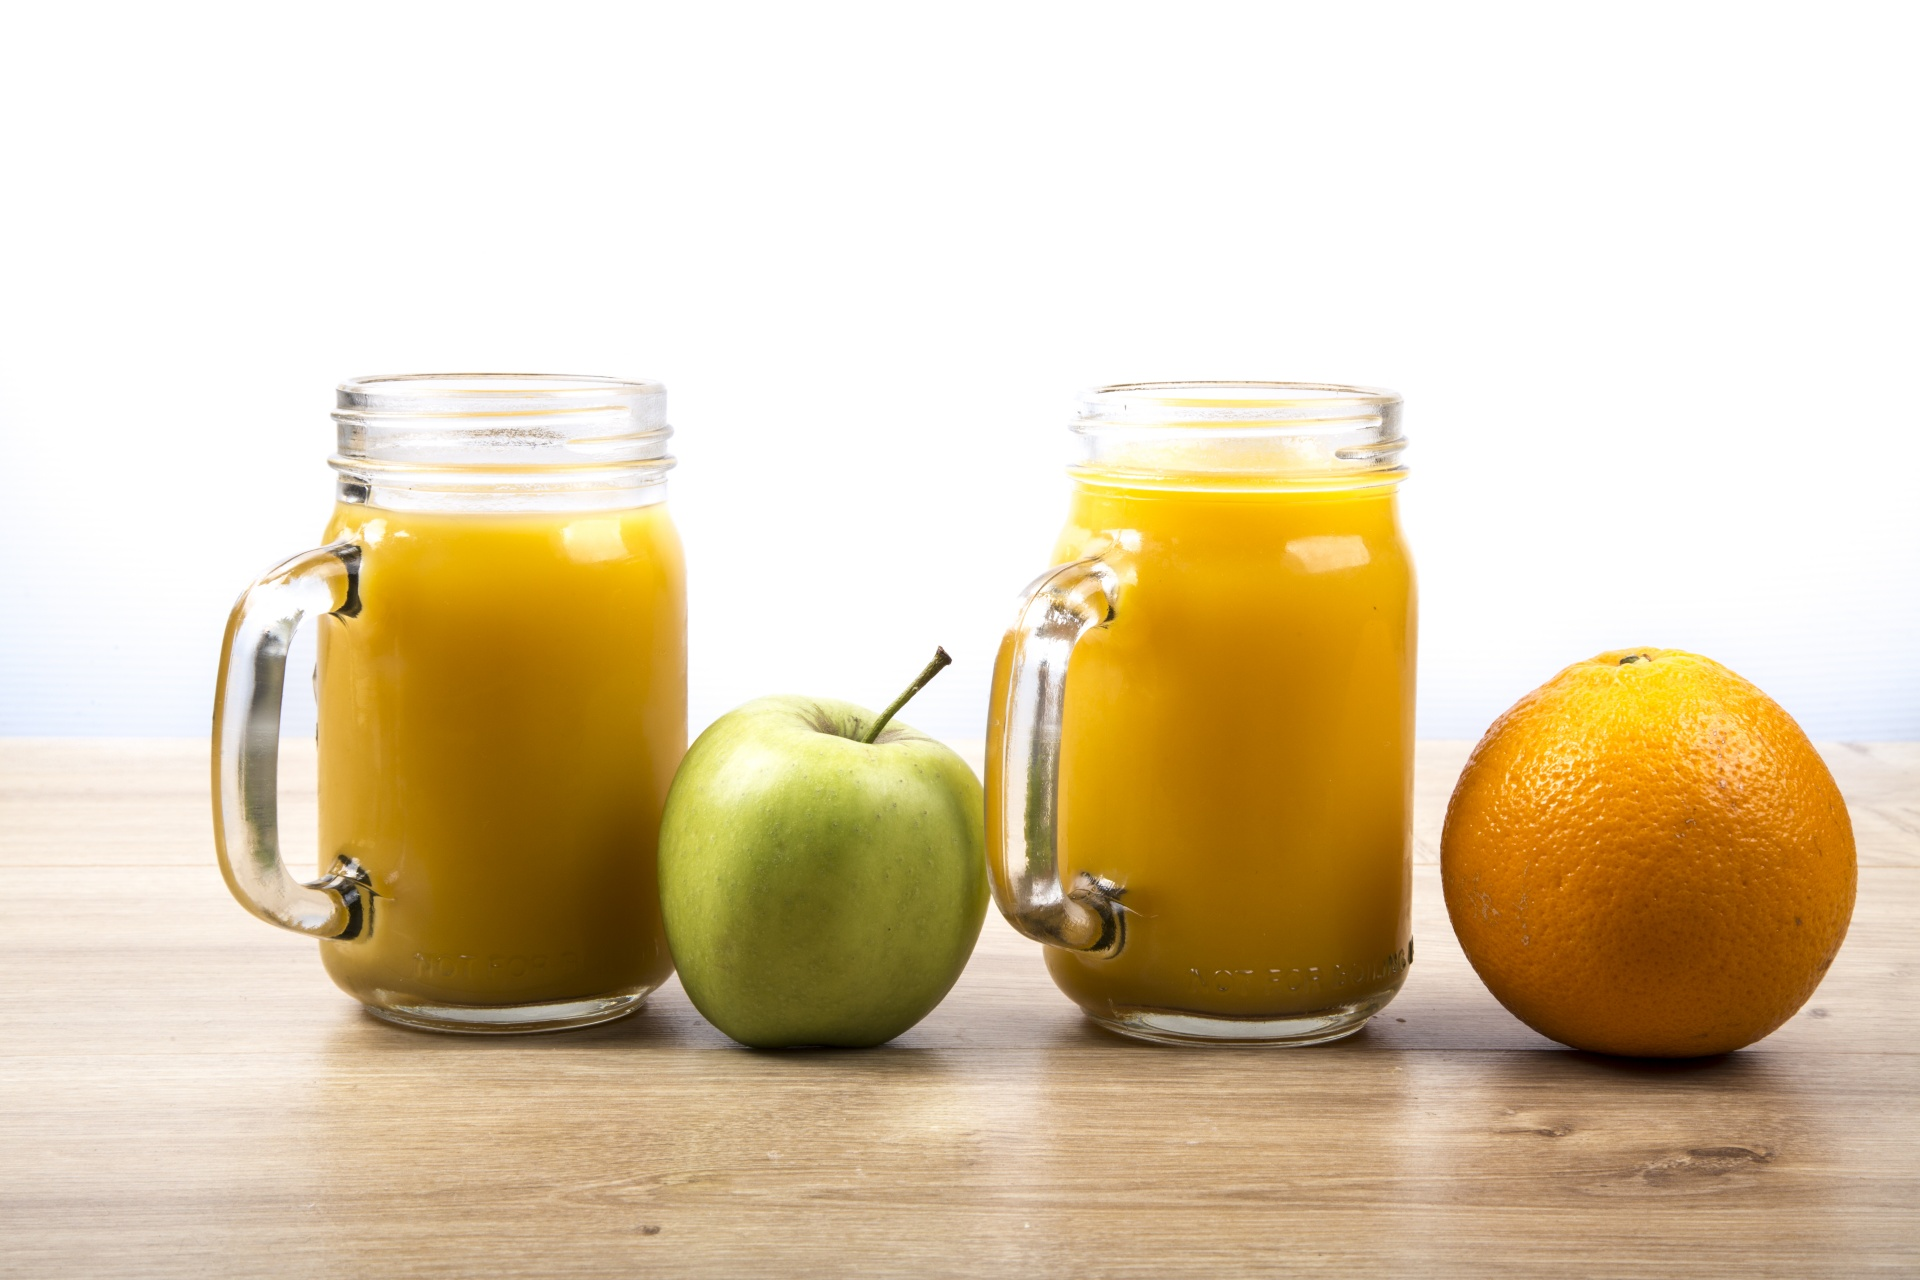 Beides schmeckt. Aber Apfelsaft  liegt uns buchstäblich näher als Orangensaft. | CC0 2017 publicdomainpictures.net/George Hodan